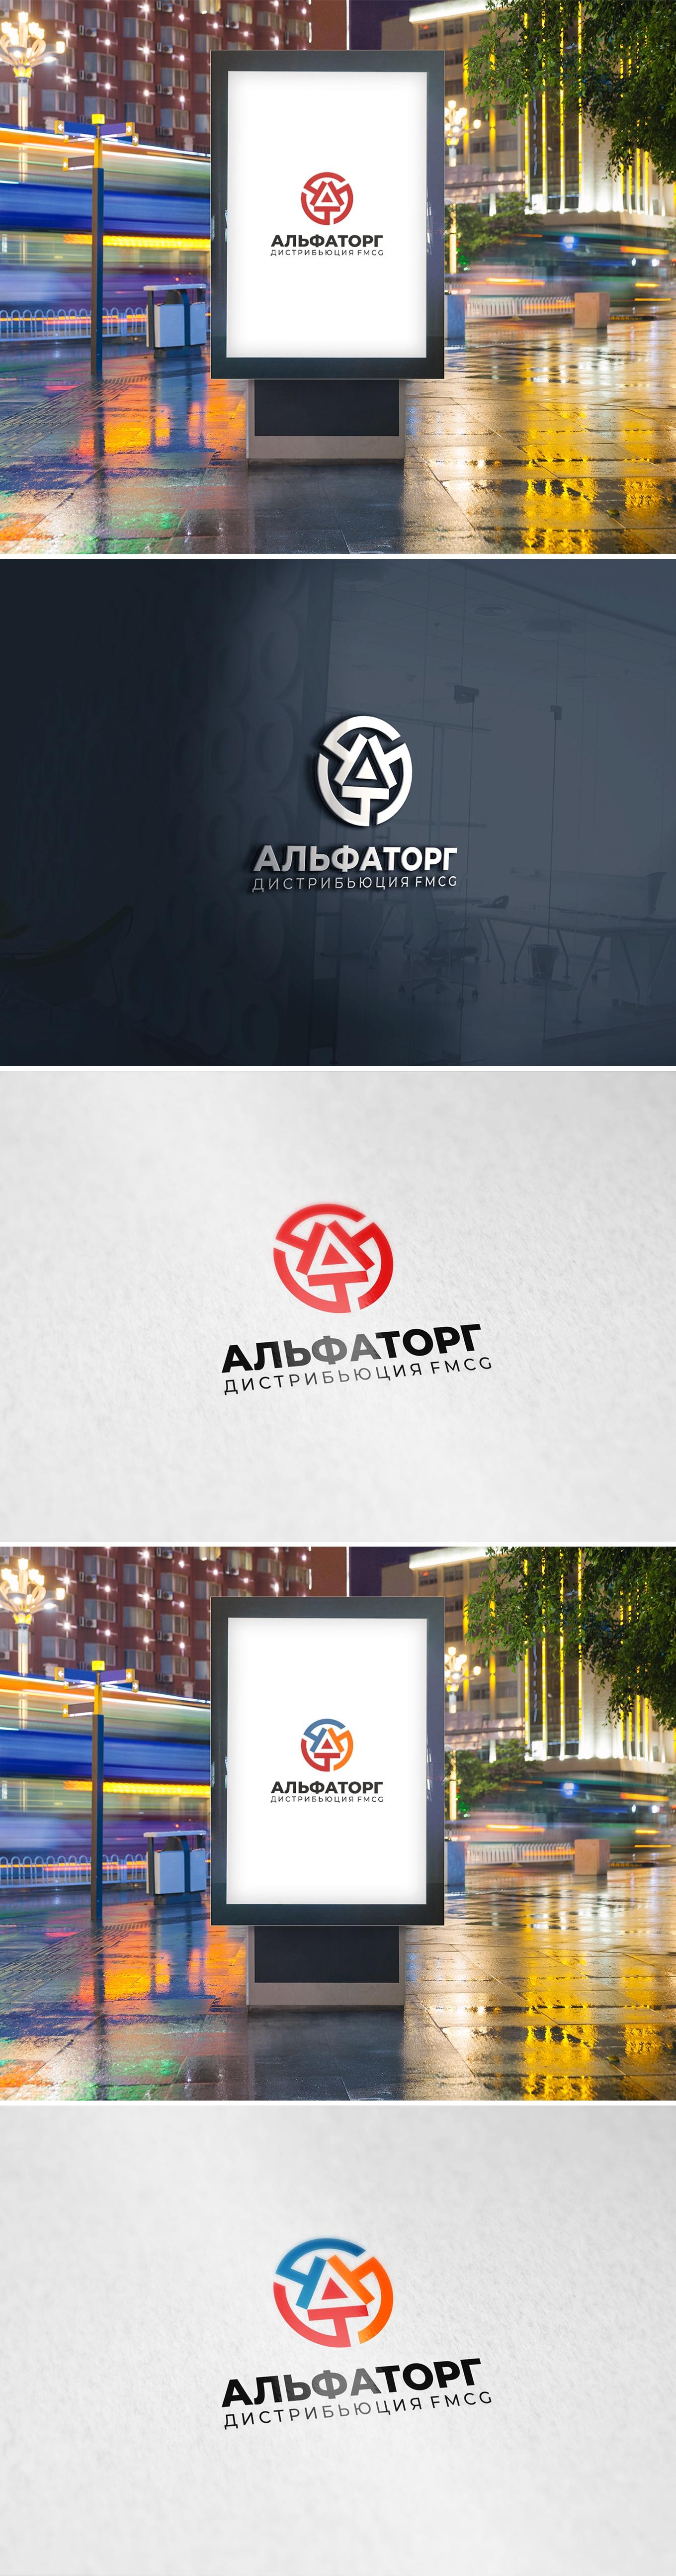 Логотип и фирменный стиль фото f_8095eff4d292e377.jpg